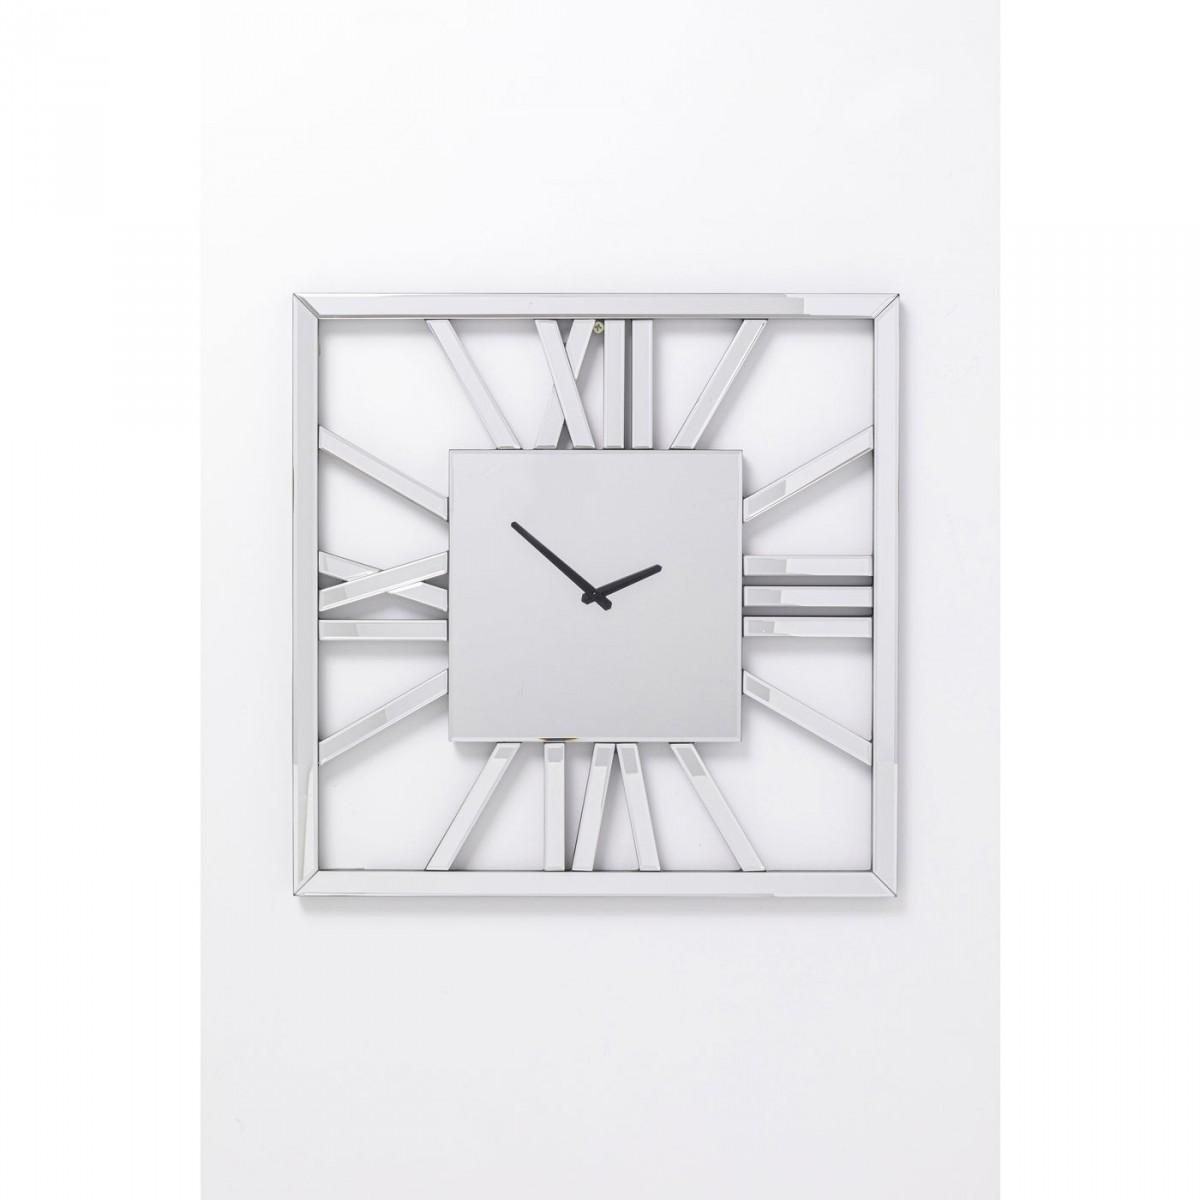 KARE DESIGN kvadratisk Specchio Square vægur - spejlglas (60x60)